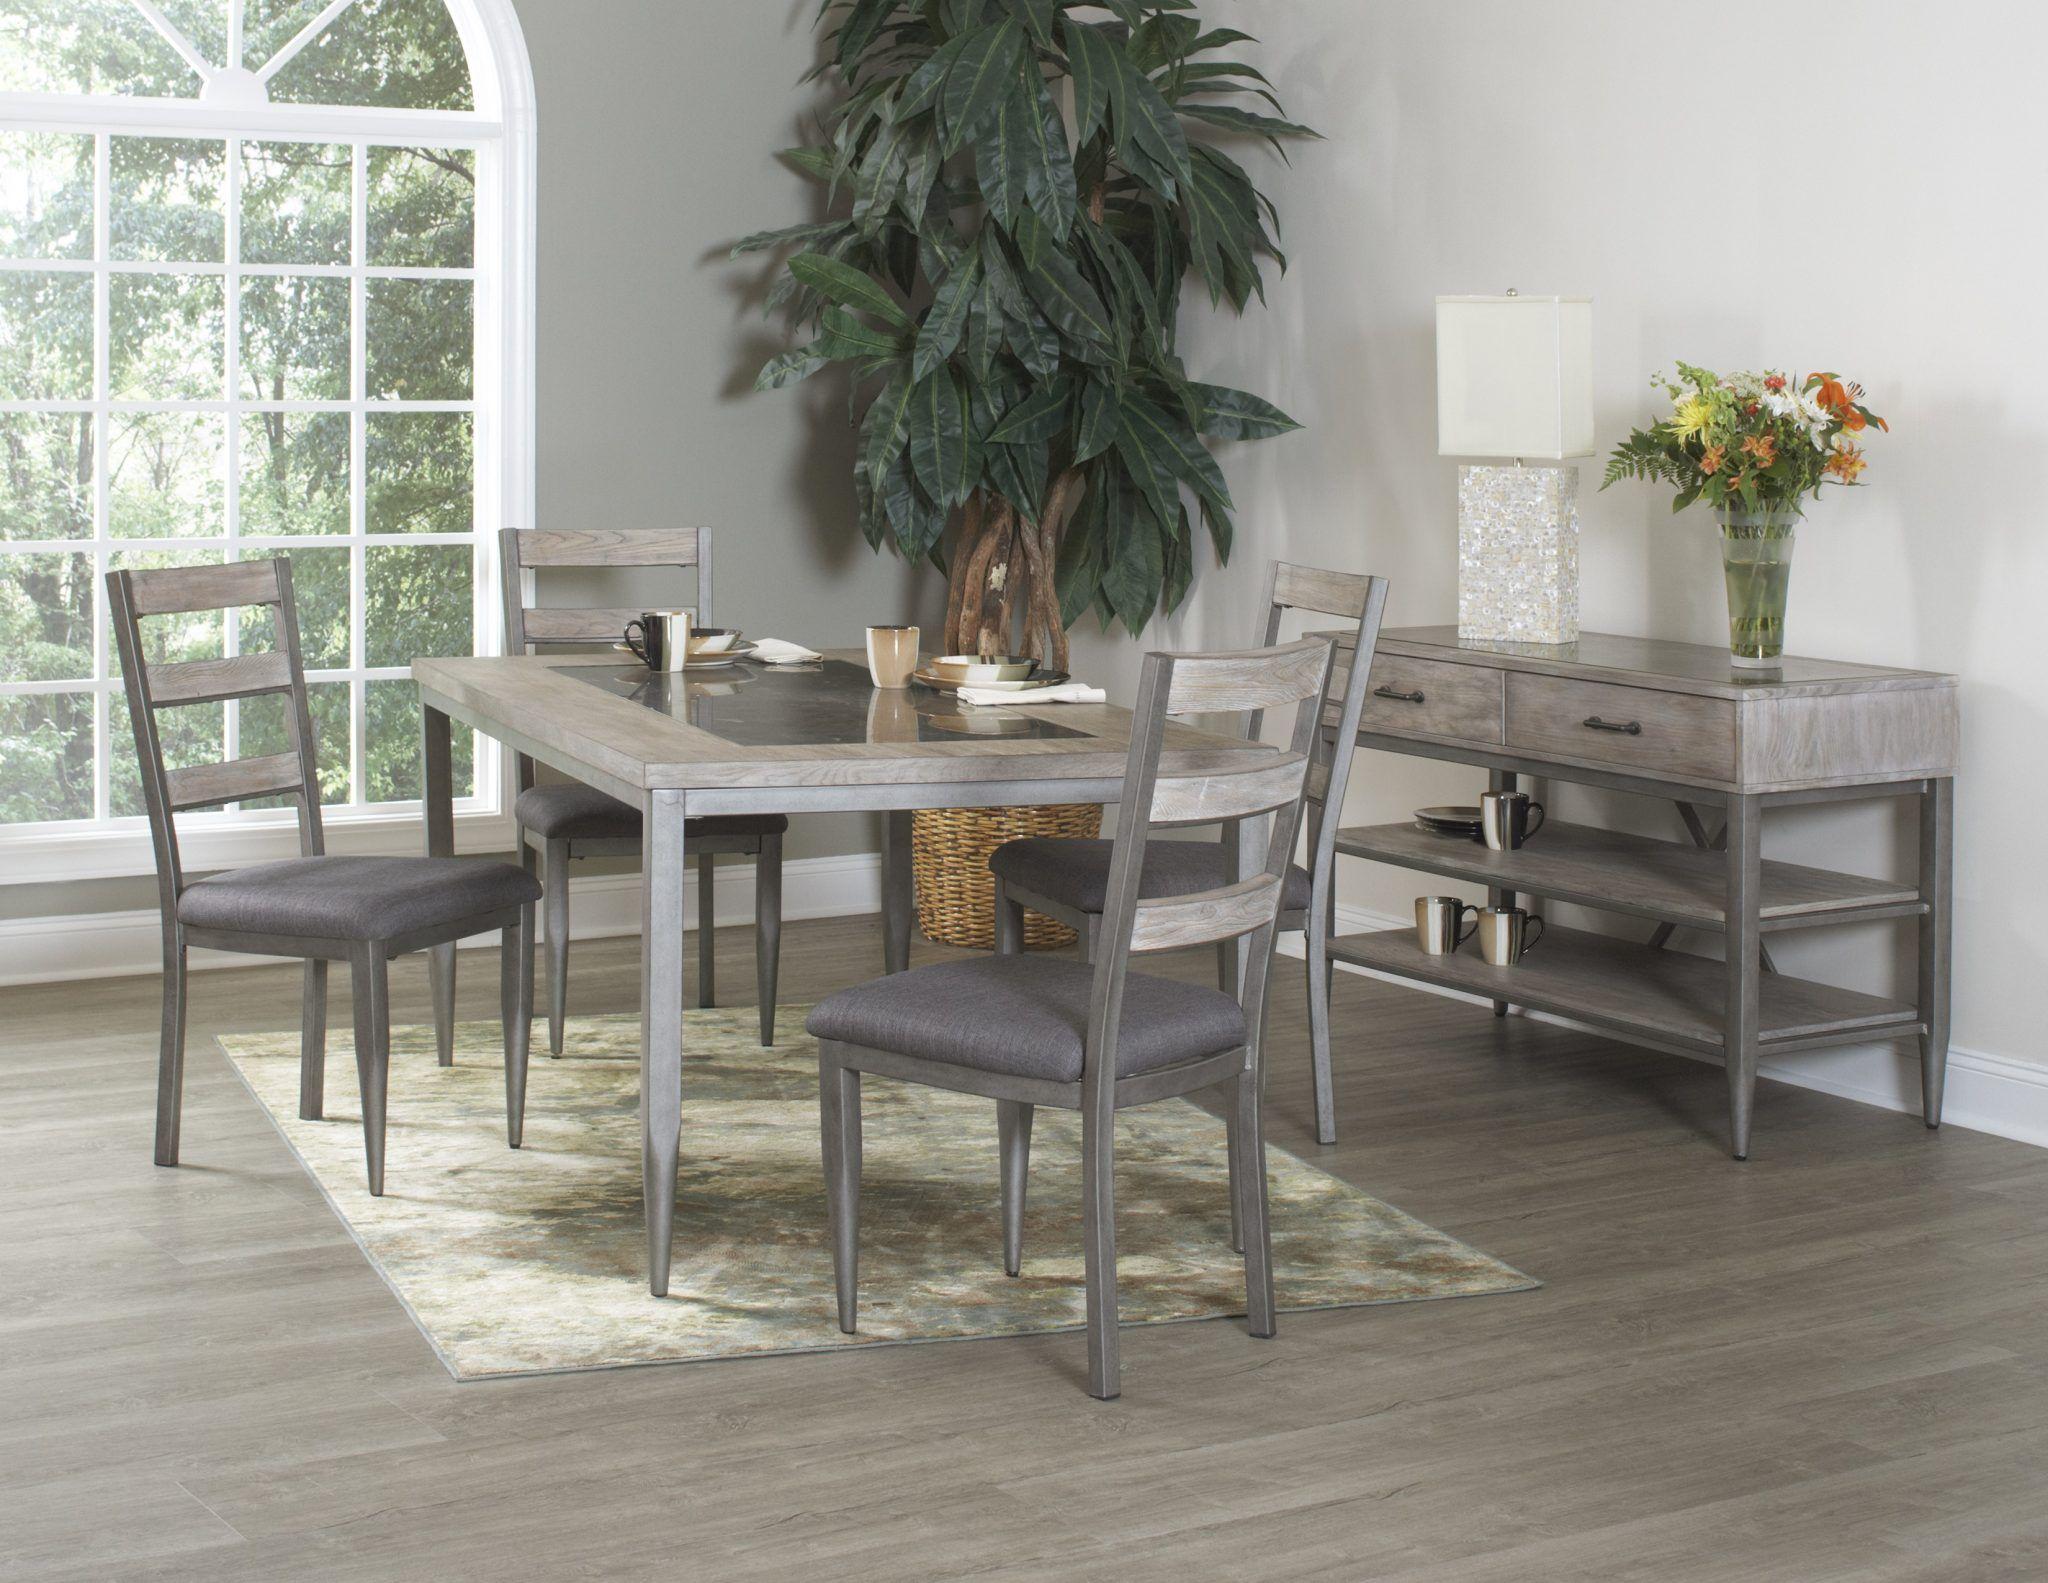 Factory direct furniture panama city beach elite modern furniture check more at